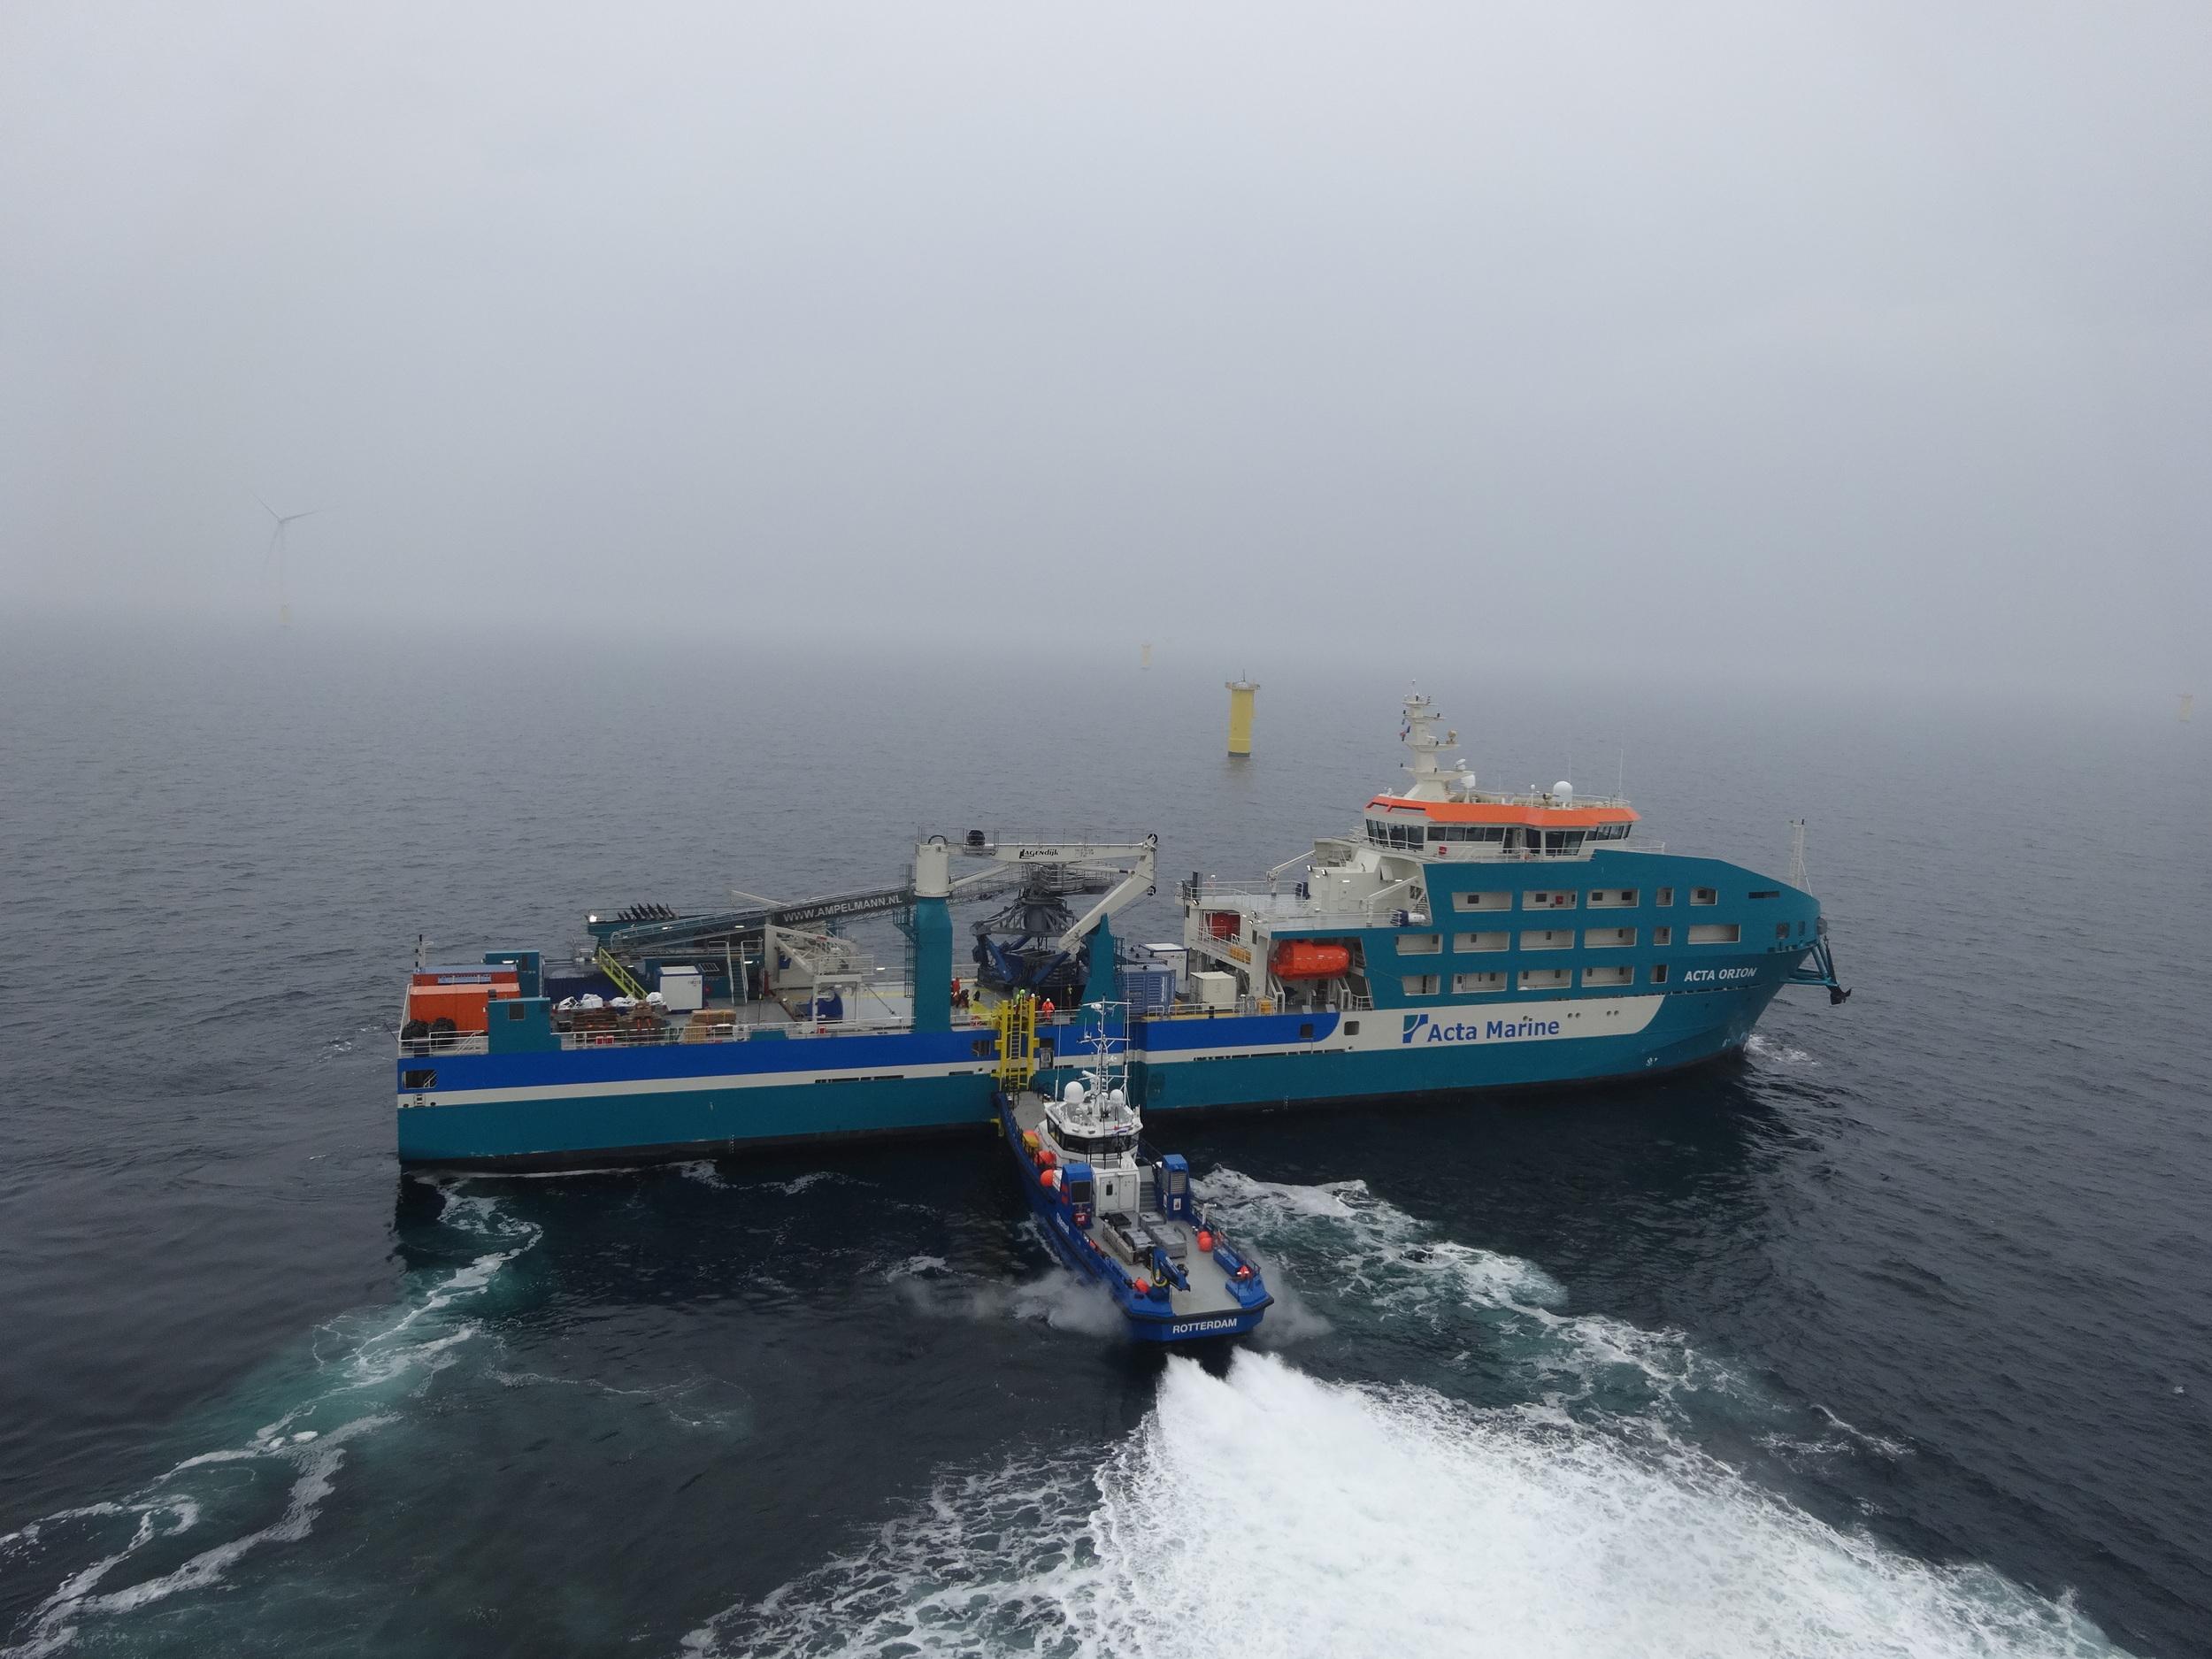 CTV tegen boatlanding Orion